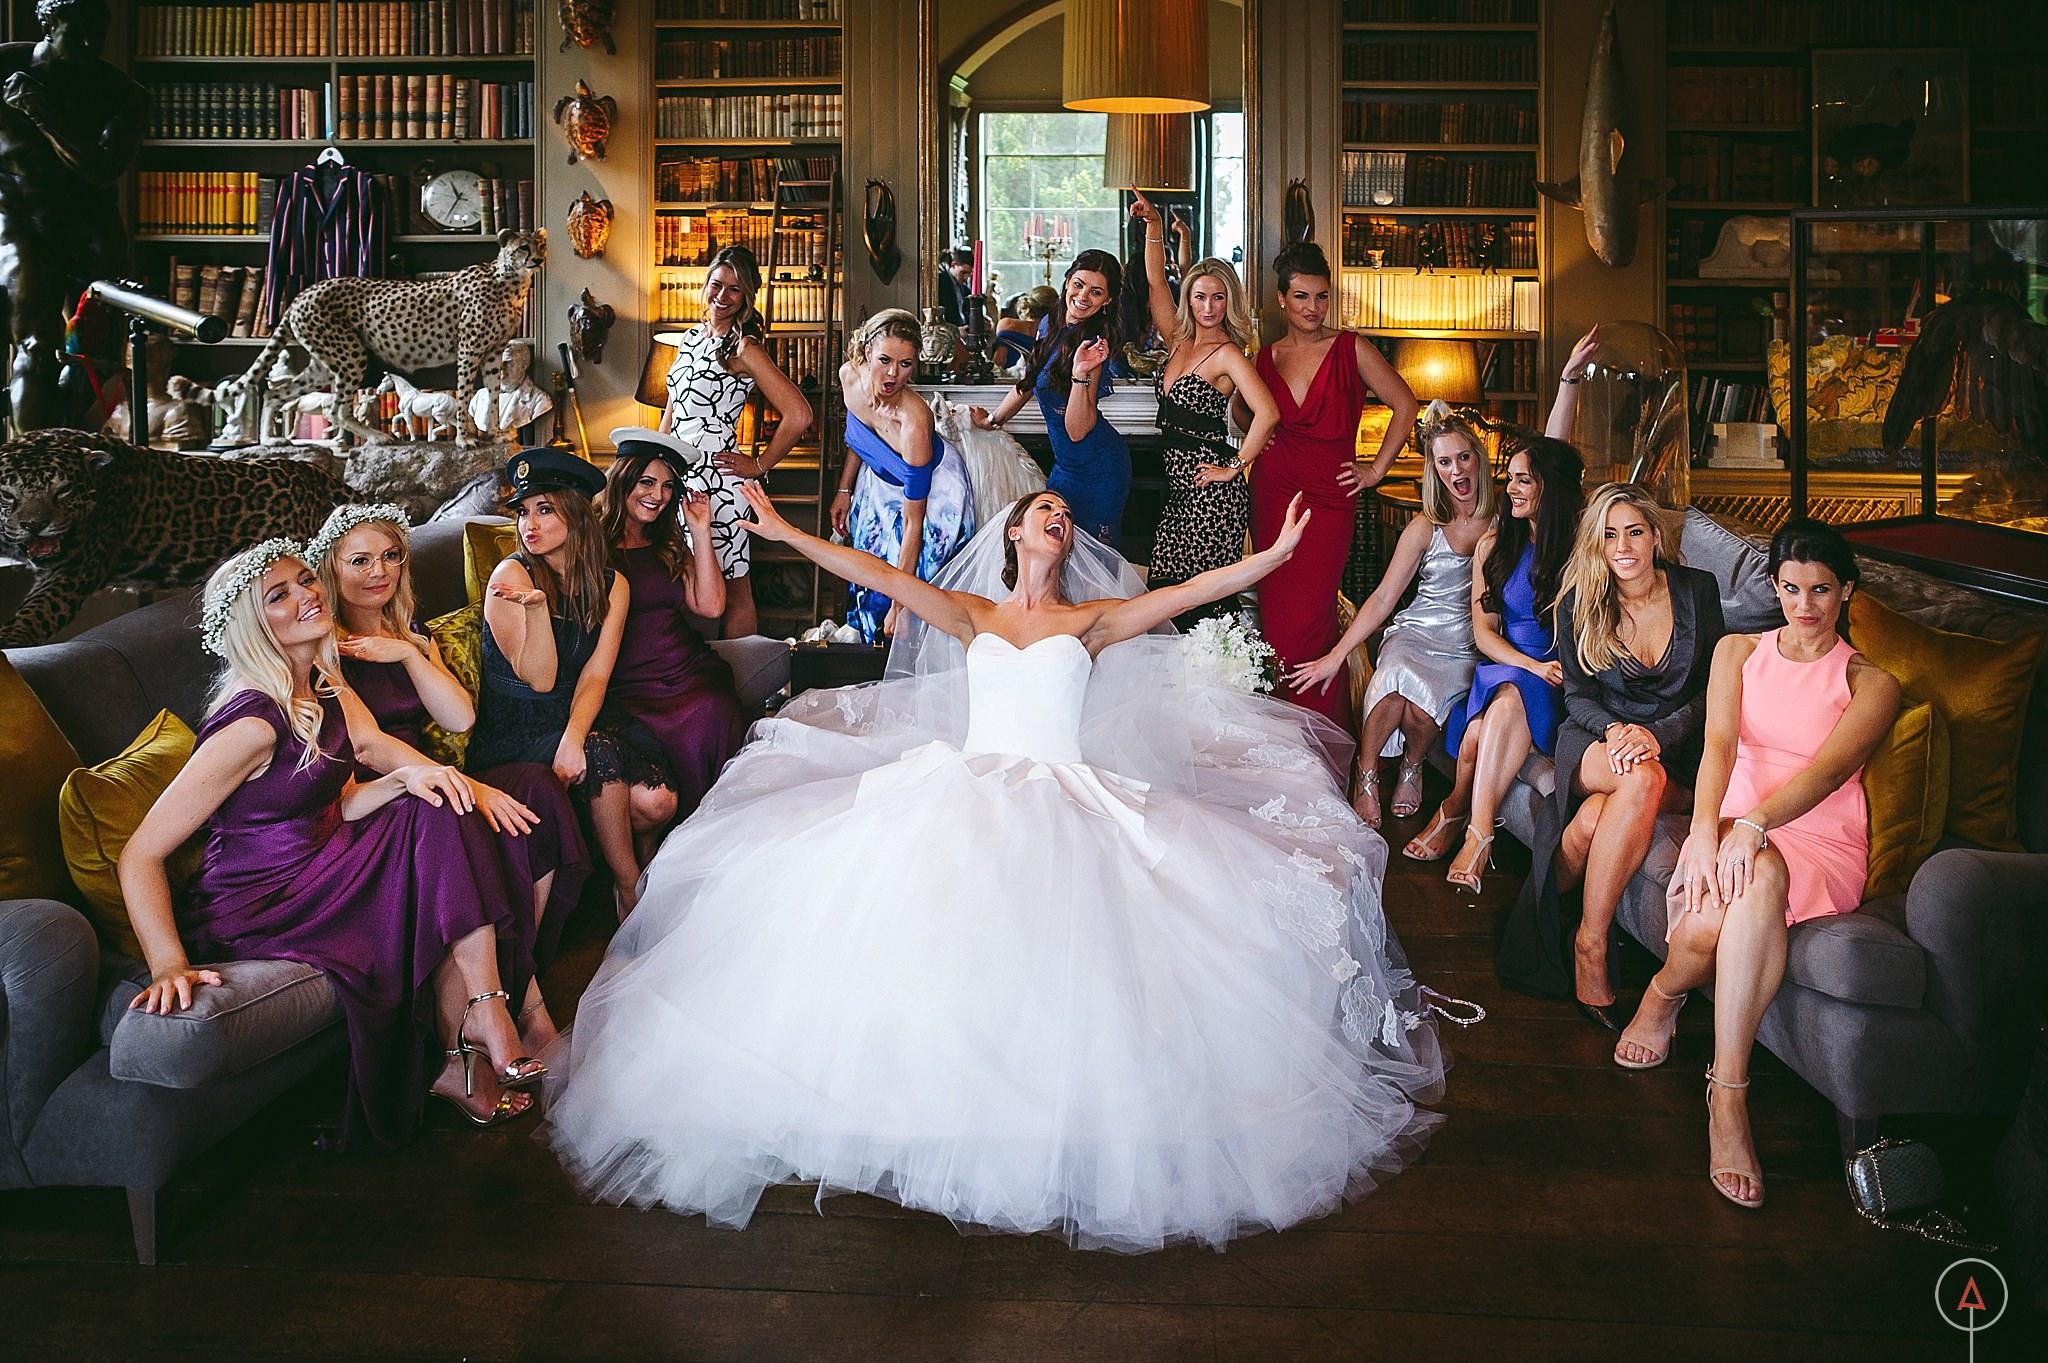 cardiff-wedding-photographer-aga-tomaszek_0283